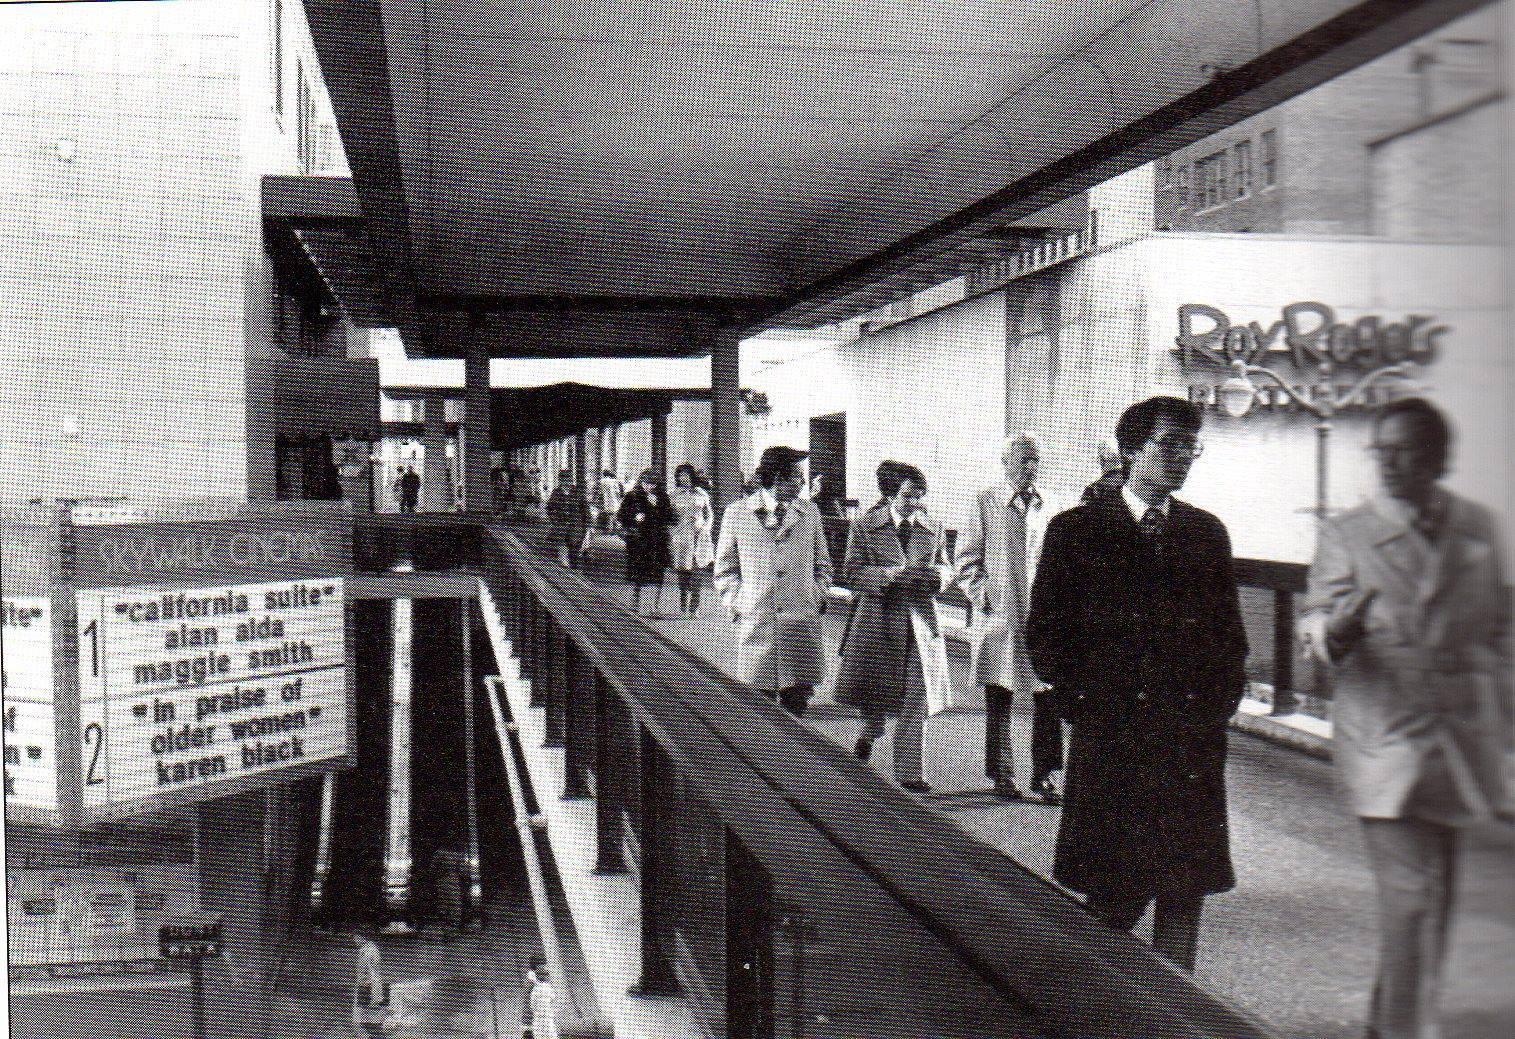 Skywalk Cinemas in Cincinnati, OH - via Ron Zig, Cincinnati Nostalgia Facebook Group